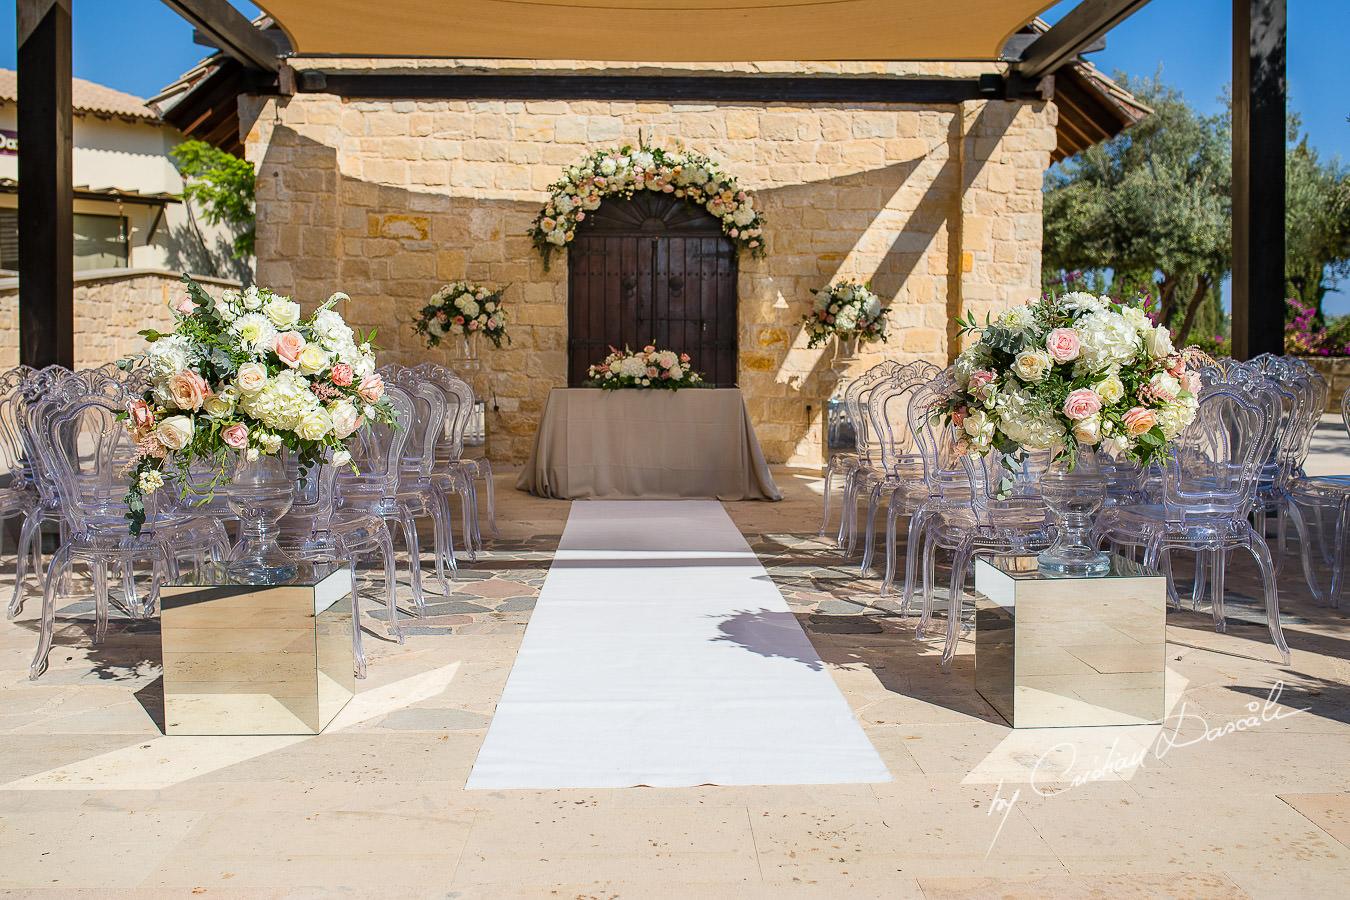 Lovely wedding setup captured by Cristian Dascalu during an elegant Aphrodite Hills Wedding in Cyprus.